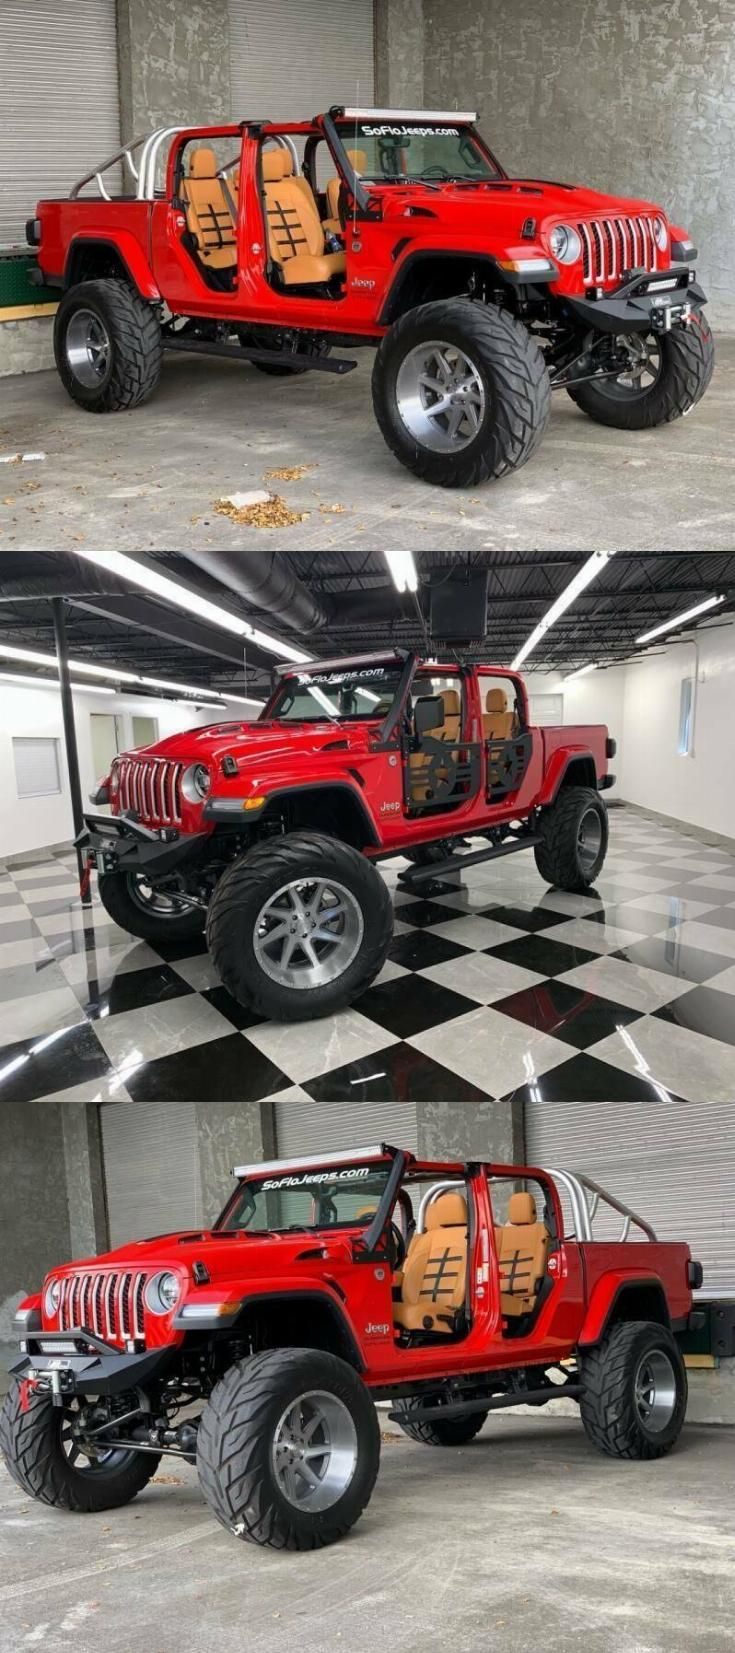 2020 Jeep Gladiator Custom Lifted Gladiator Ferrari Edition In 2020 Jeep Gladiator Dream Cars Jeep Lifted Jeep